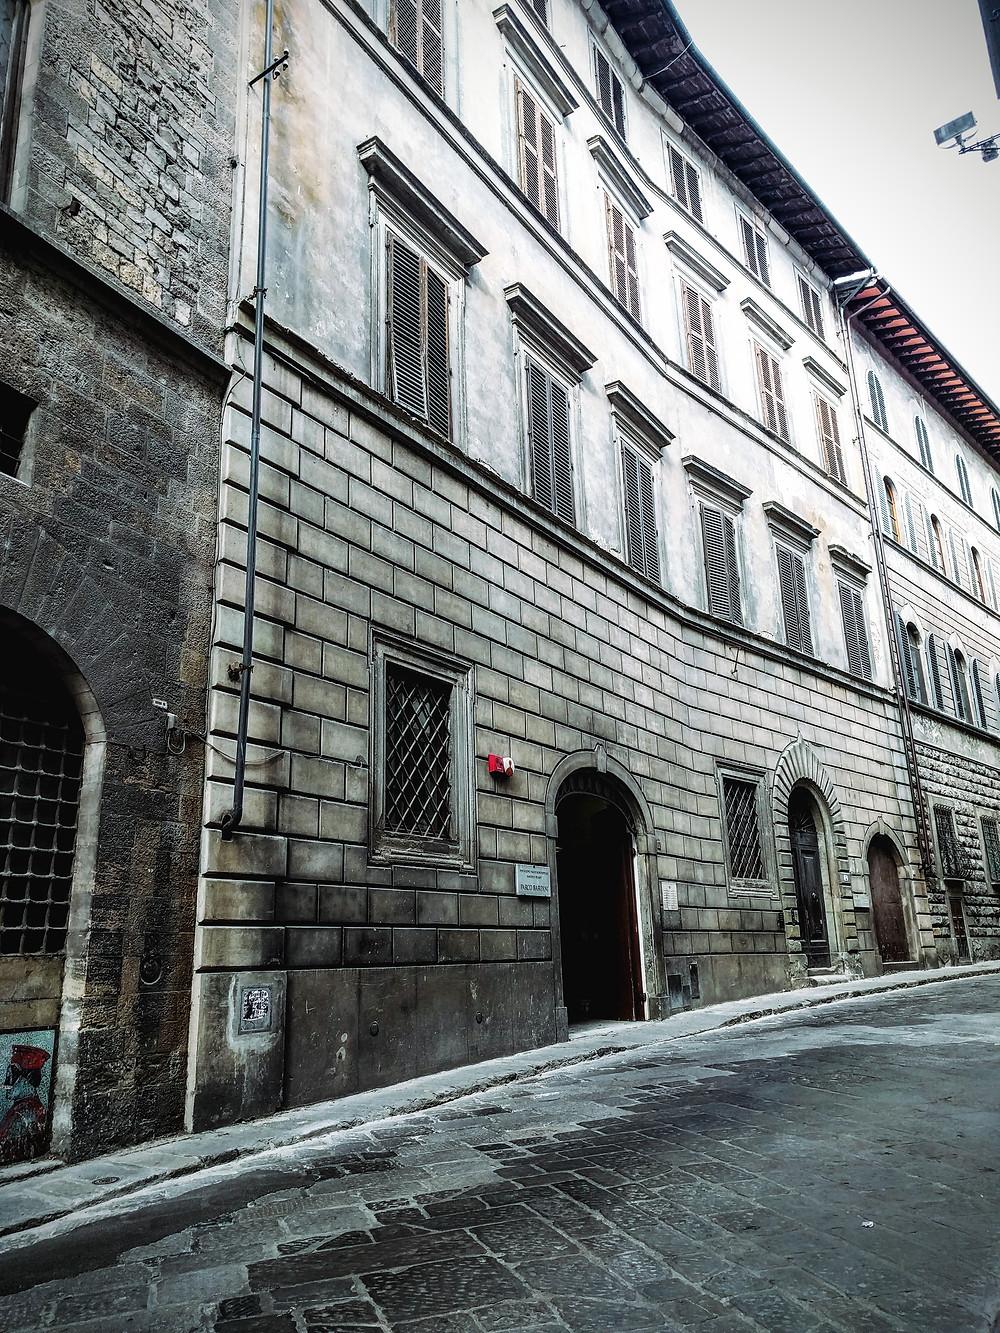 Altrarno (Florence, Italy)